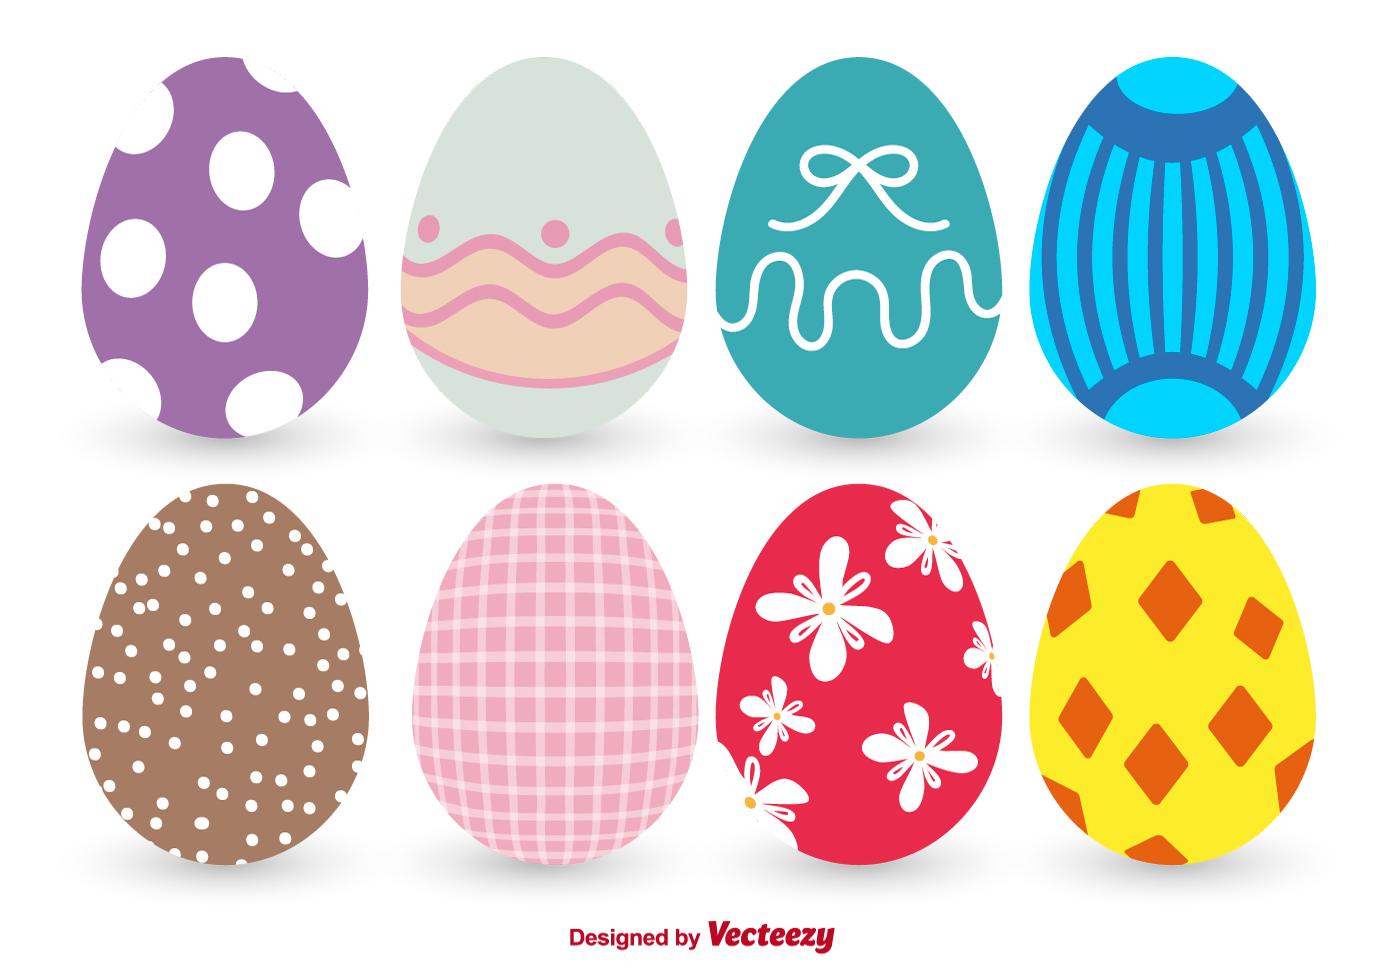 Colorful Easter Egg Vectors - Download Free Vector Art ...